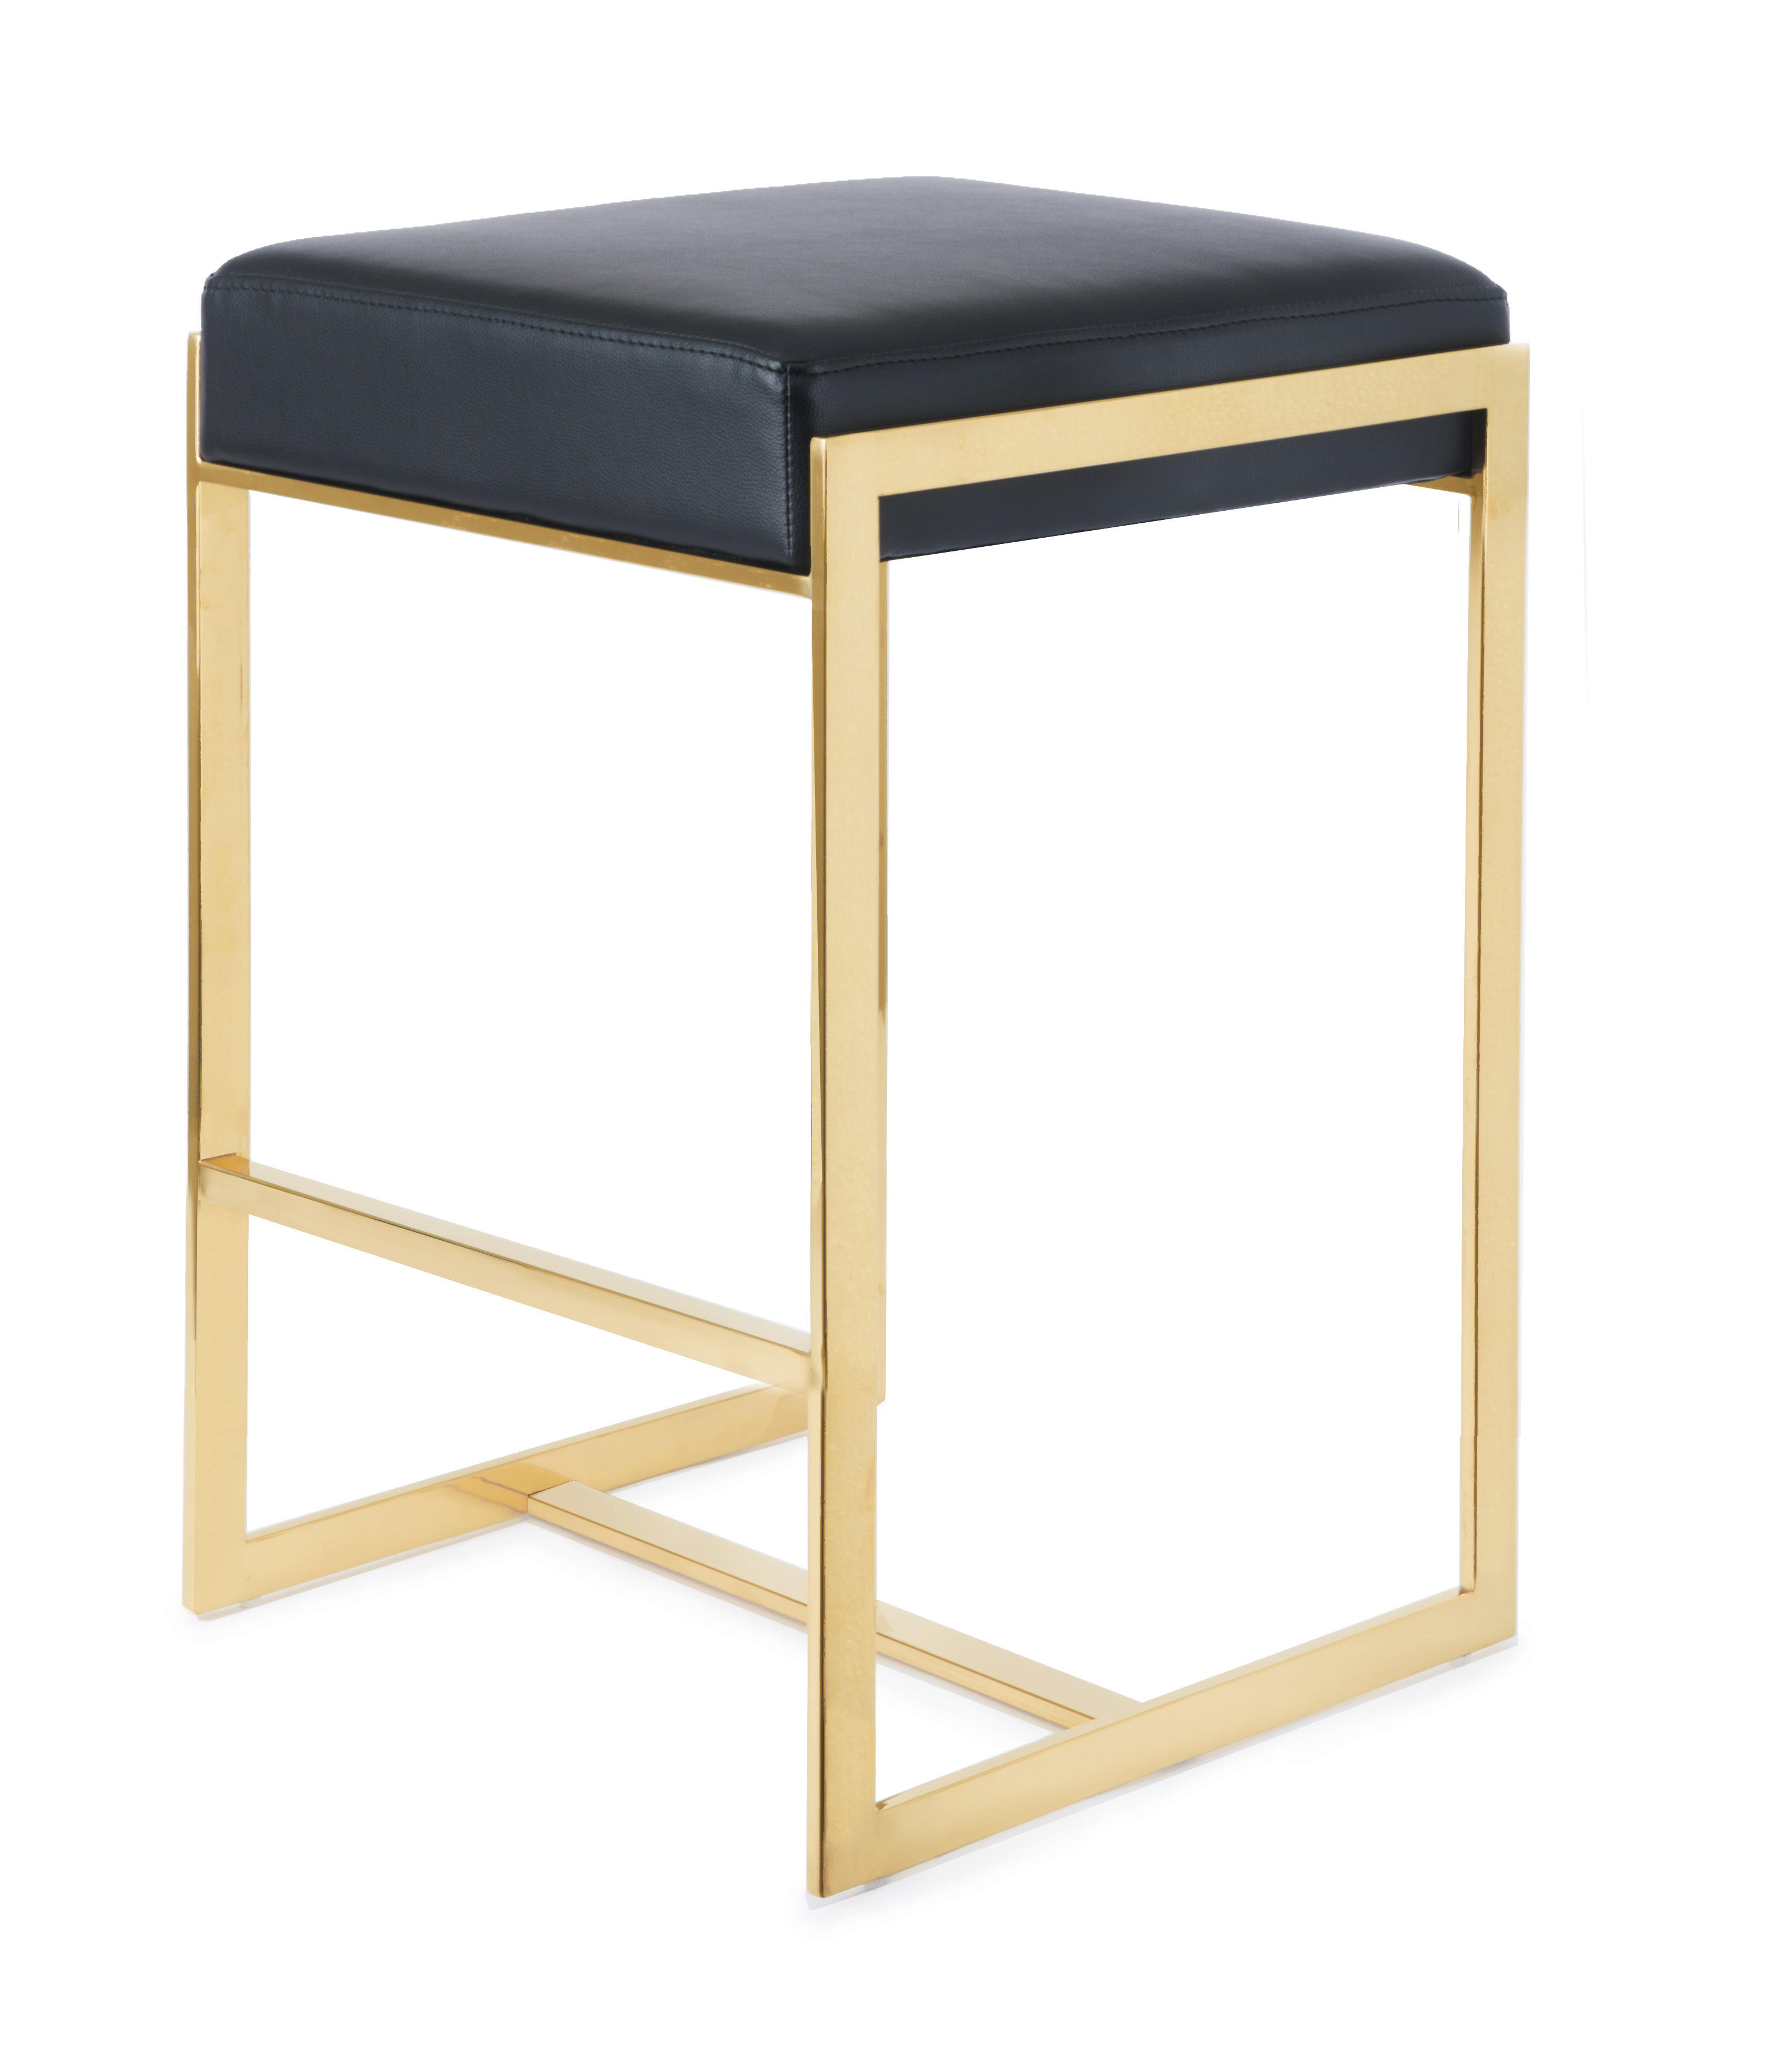 palmer-counter-stool-in-black.jpg